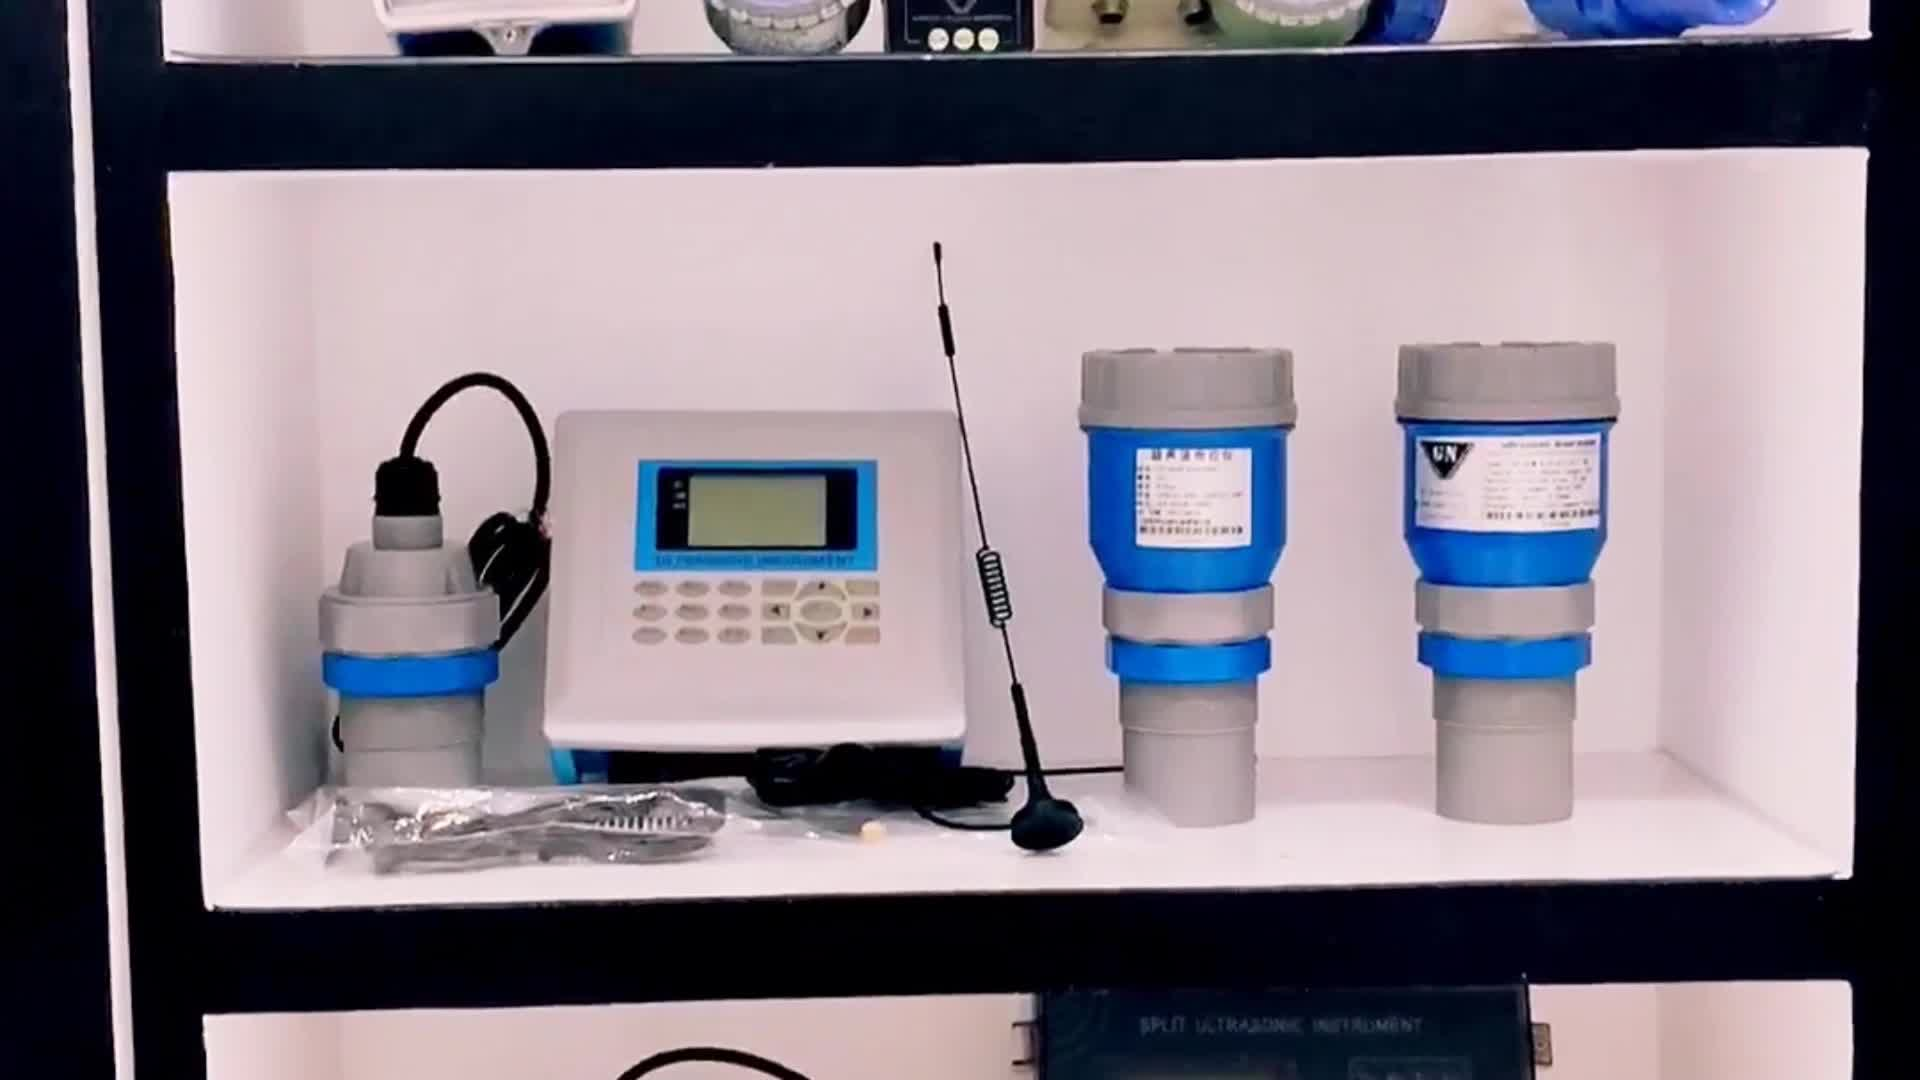 8M Wster น้ำ Ultrasonic Acid Liquid การใช้ถังเซ็นเซอร์ระดับ